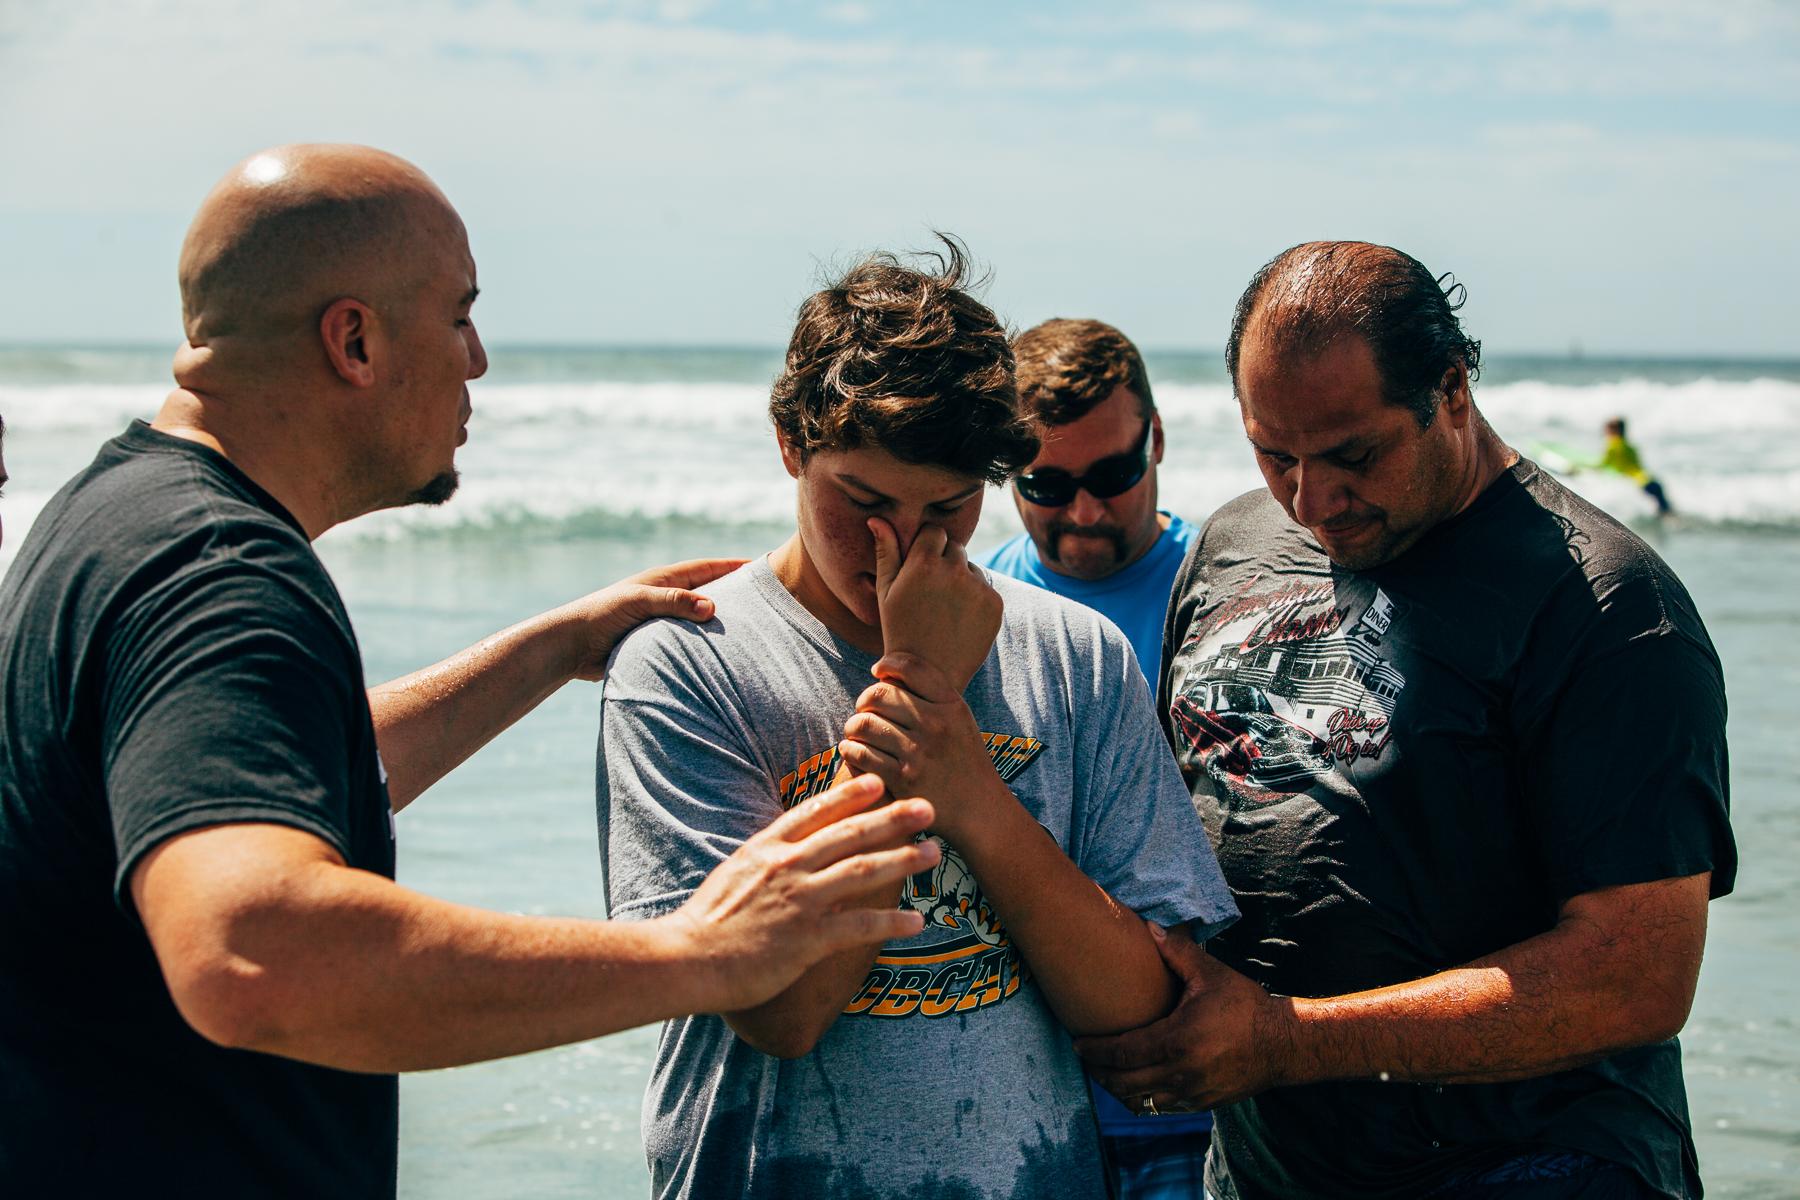 Beach_Baptism_2015_44.jpg